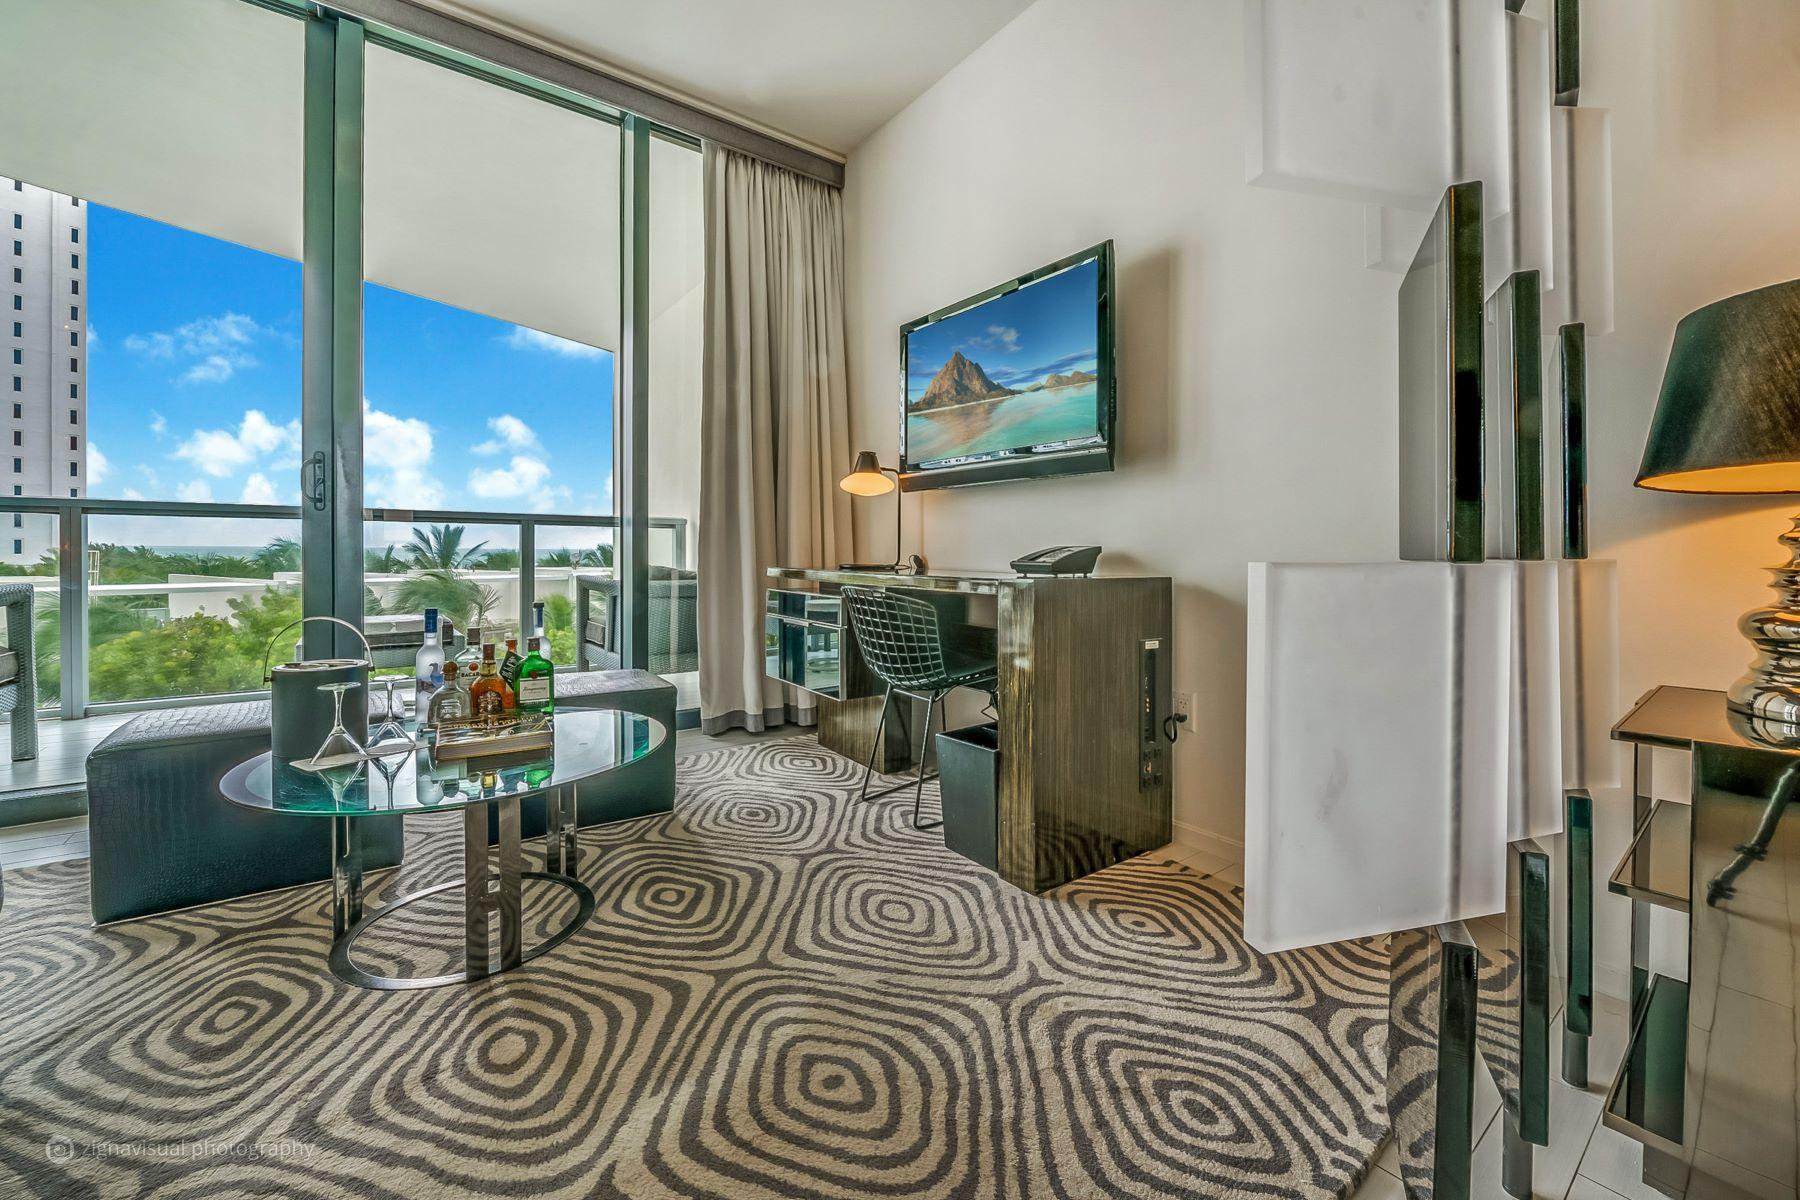 Condominium for Sale at 2201 COLLINS AVE # 423 2201 Collins Ave 423 Miami Beach, Florida, 33139 United States